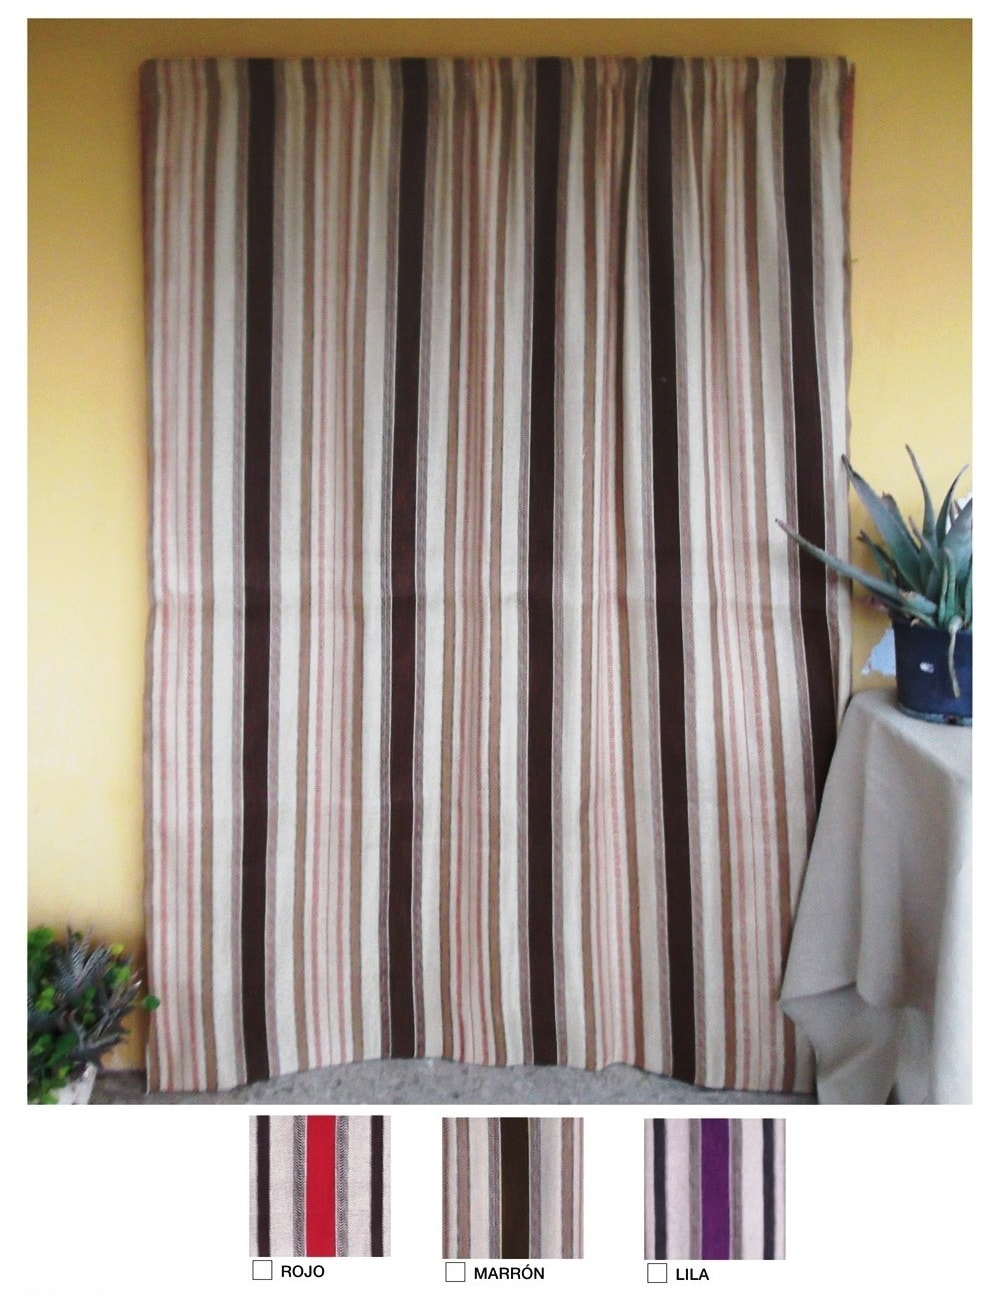 Design ikea cortinas de puertas : Cortina Puerta Exterior Ikea. Cheap Cortina De Puerta Laos ...